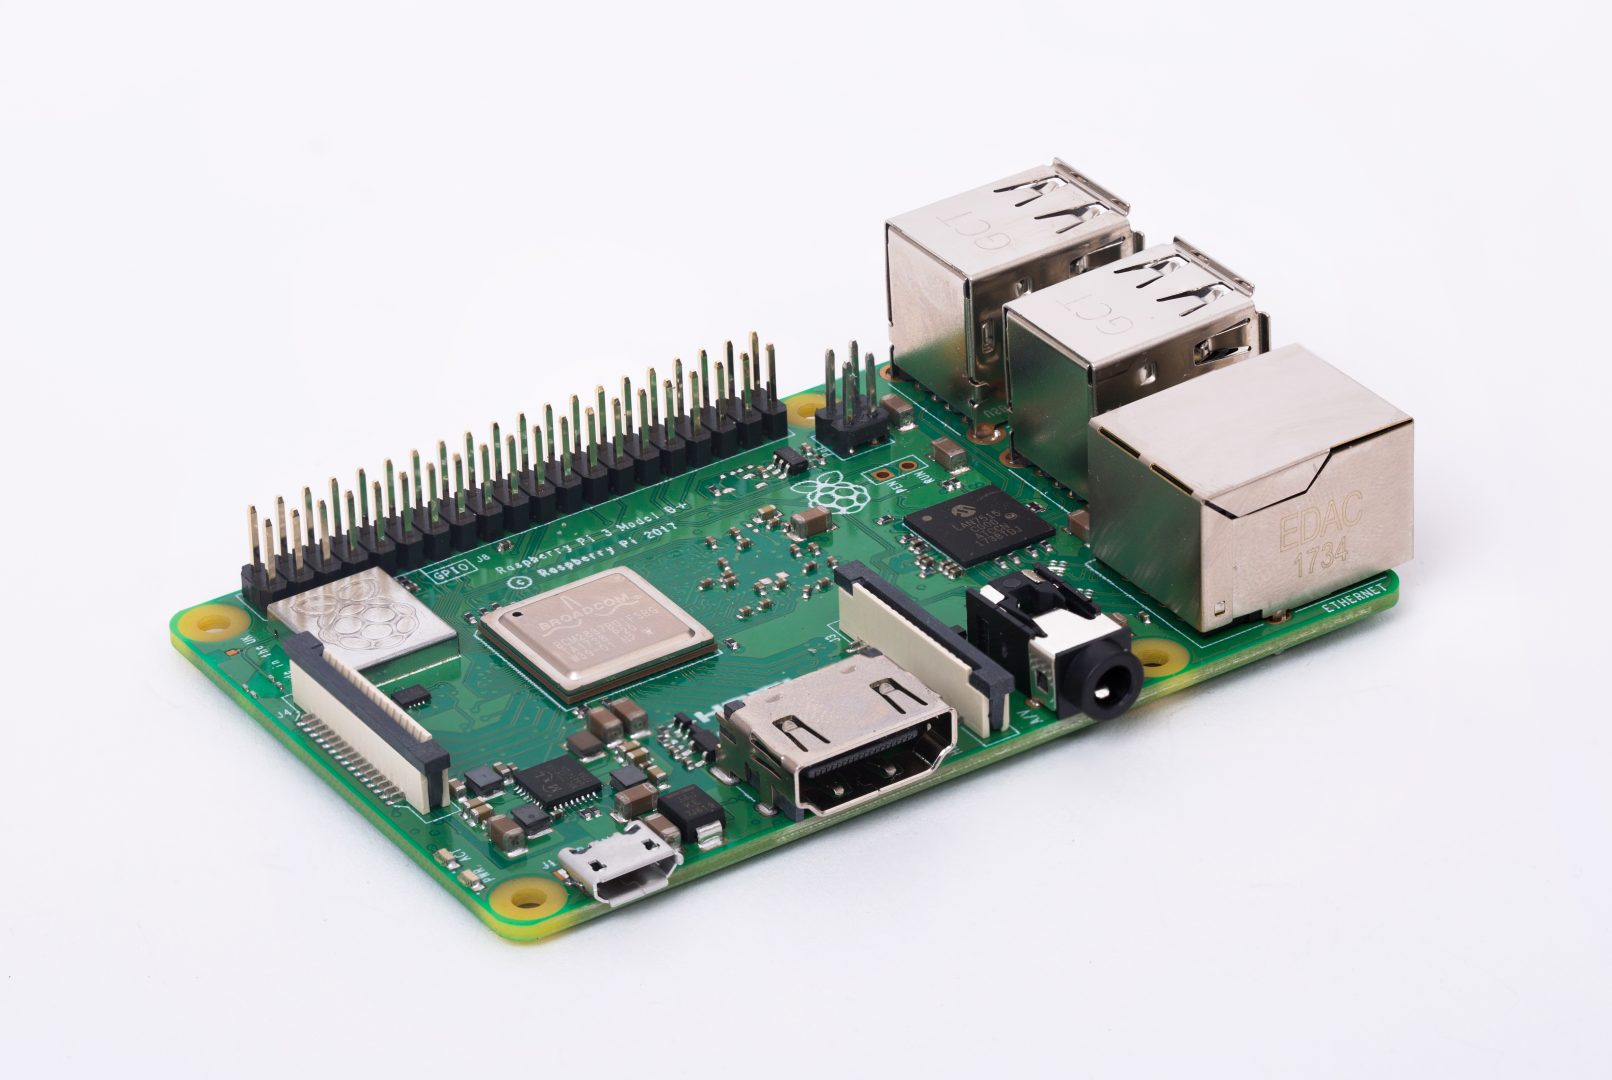 62355571bd8b86 Raspberry Pi 3 Model B+ - Mikrocontroller.net